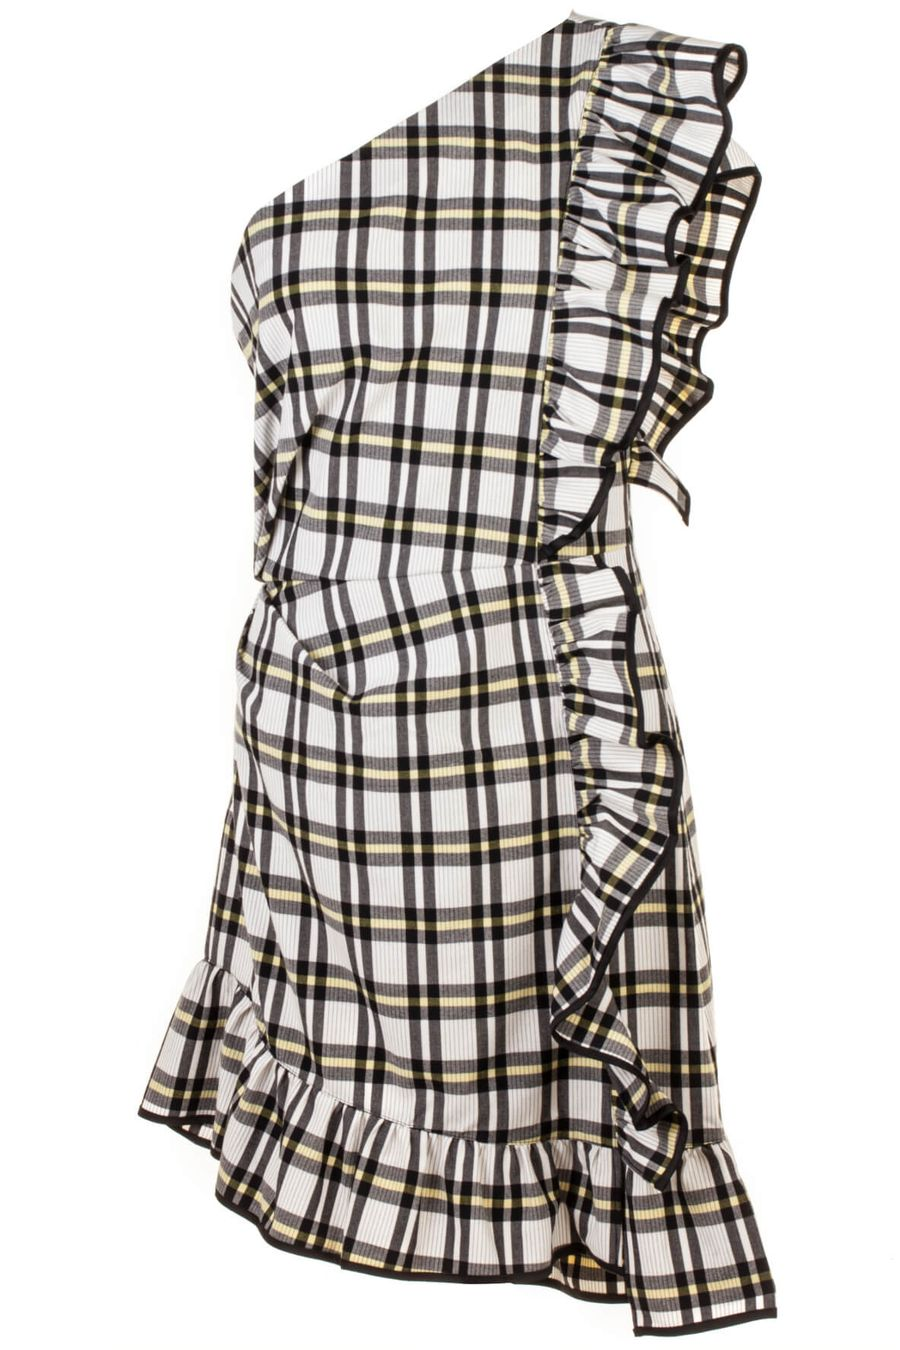 isabelle-one-shoulder-checkered-dress-1